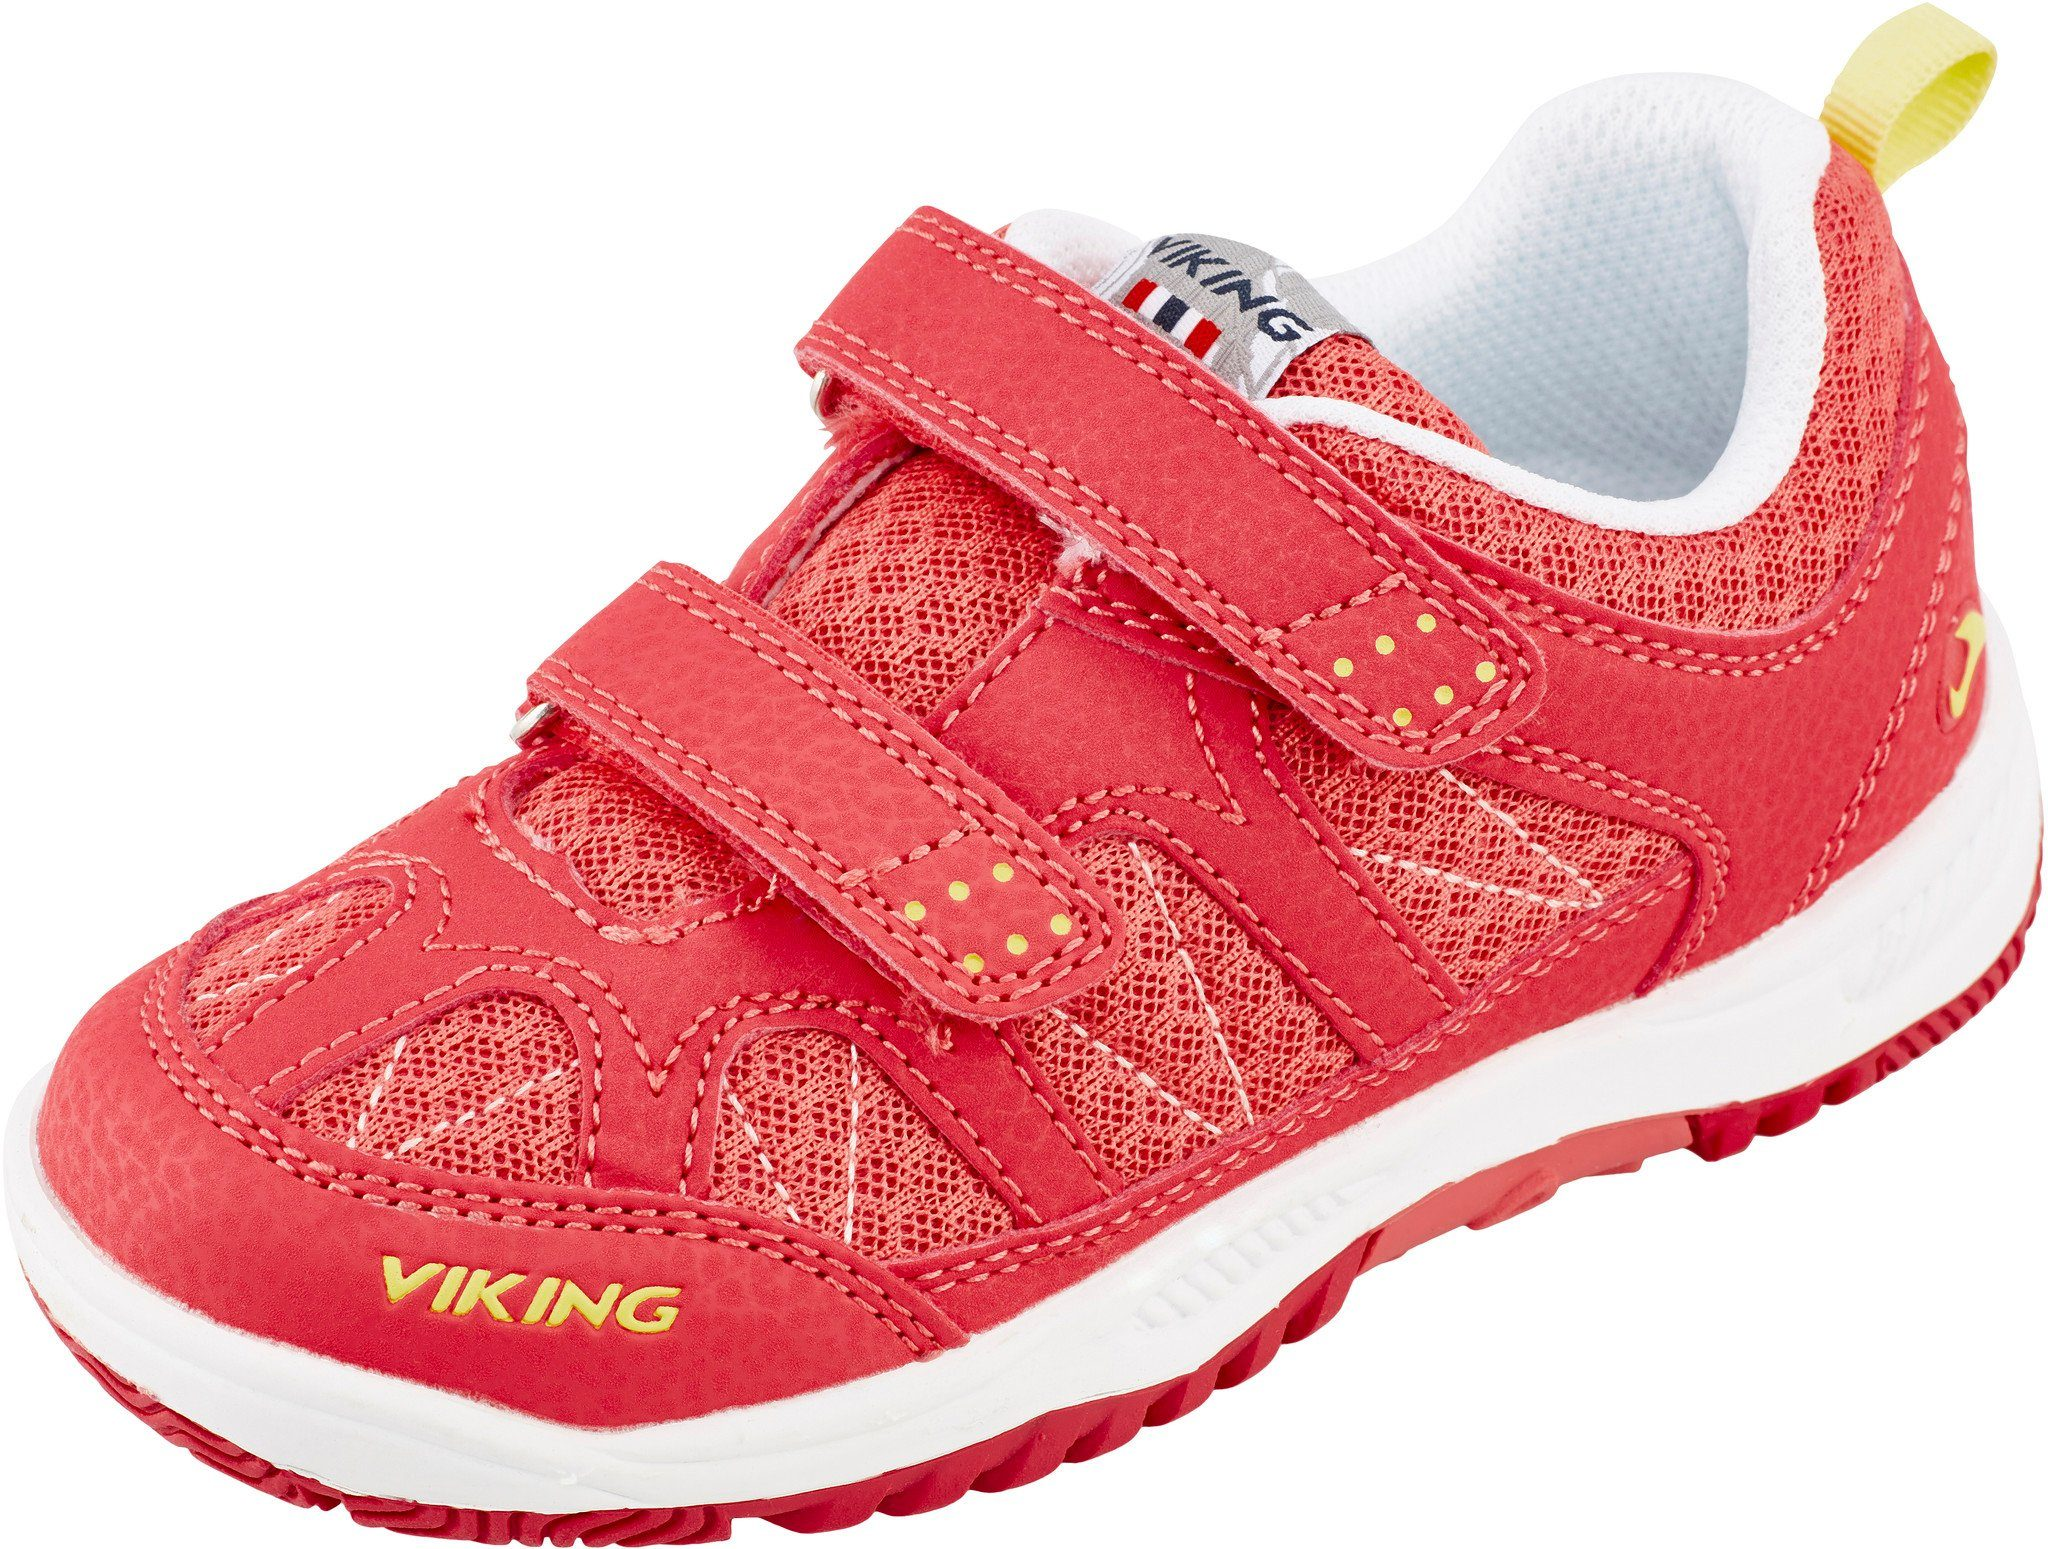 Viking Kletterschuh »Viking Vinstra II Shoes Kids«